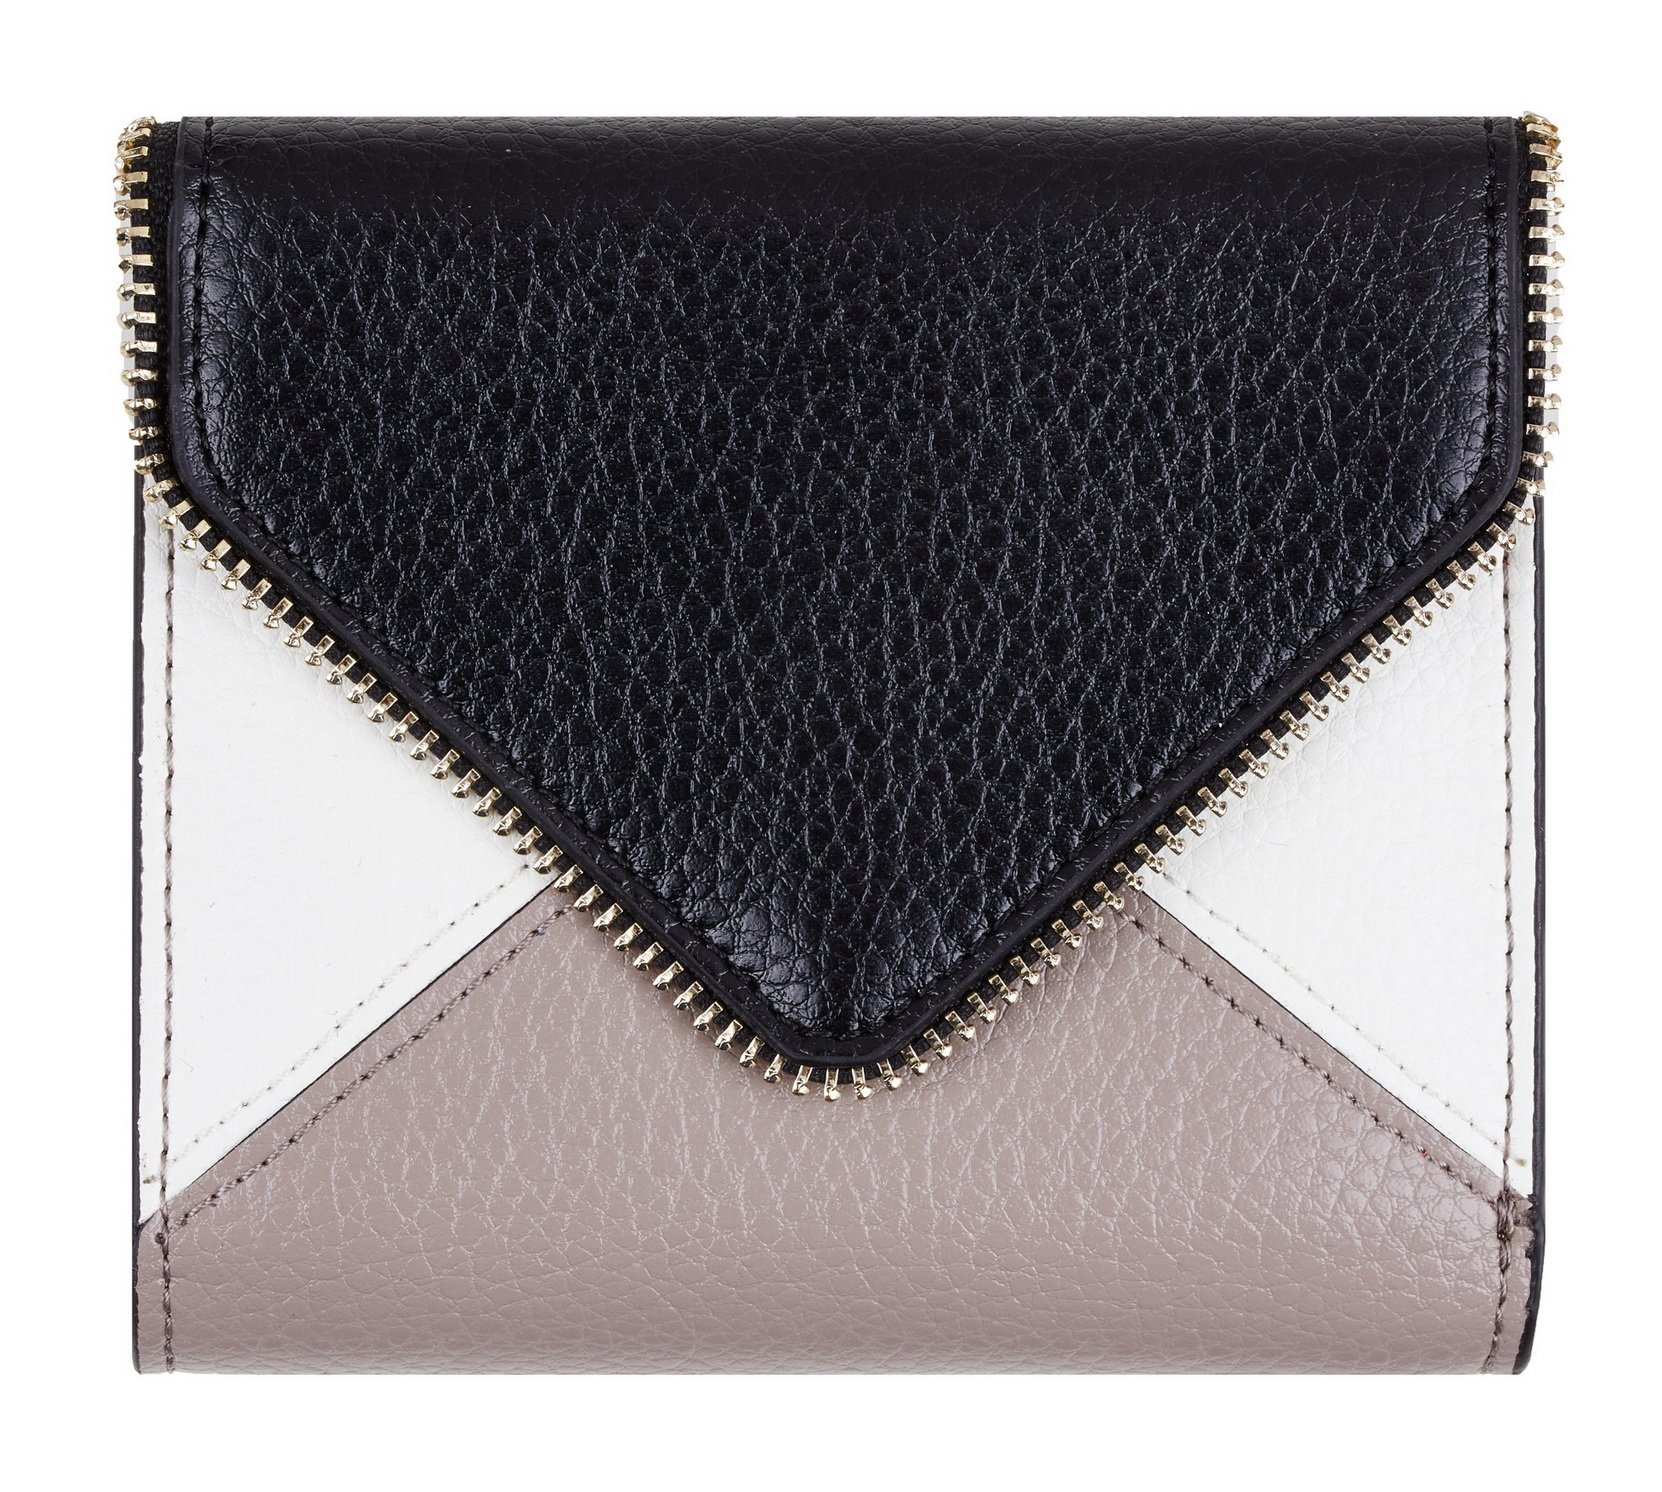 NapaWalli Womens Rfid Blocking Small Compact Bifold Luxury Genuine Leather Pocket Wallet Ladies Mini Purse with ID Window (envelop black)